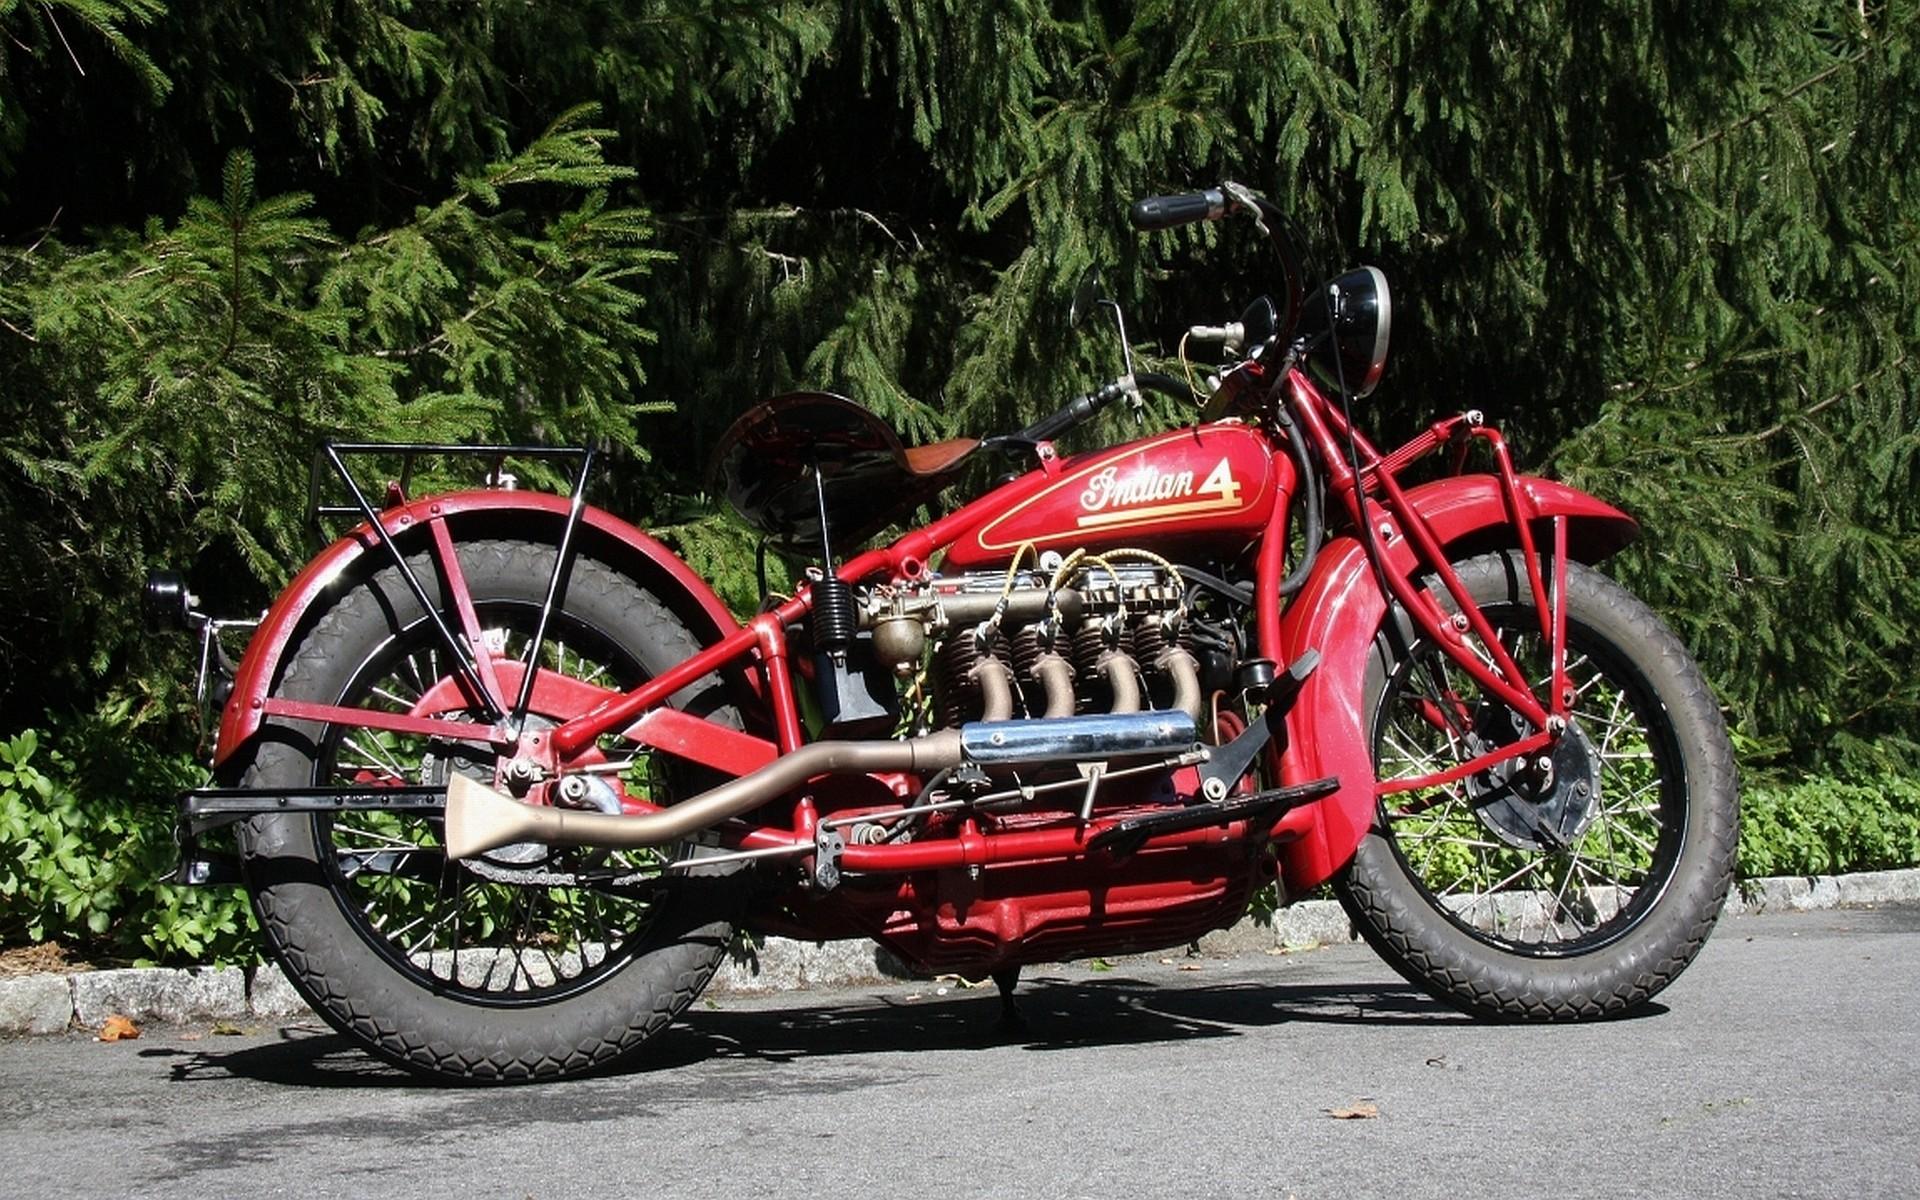 Wallpaper car bicycle motorcycle vintage chopper